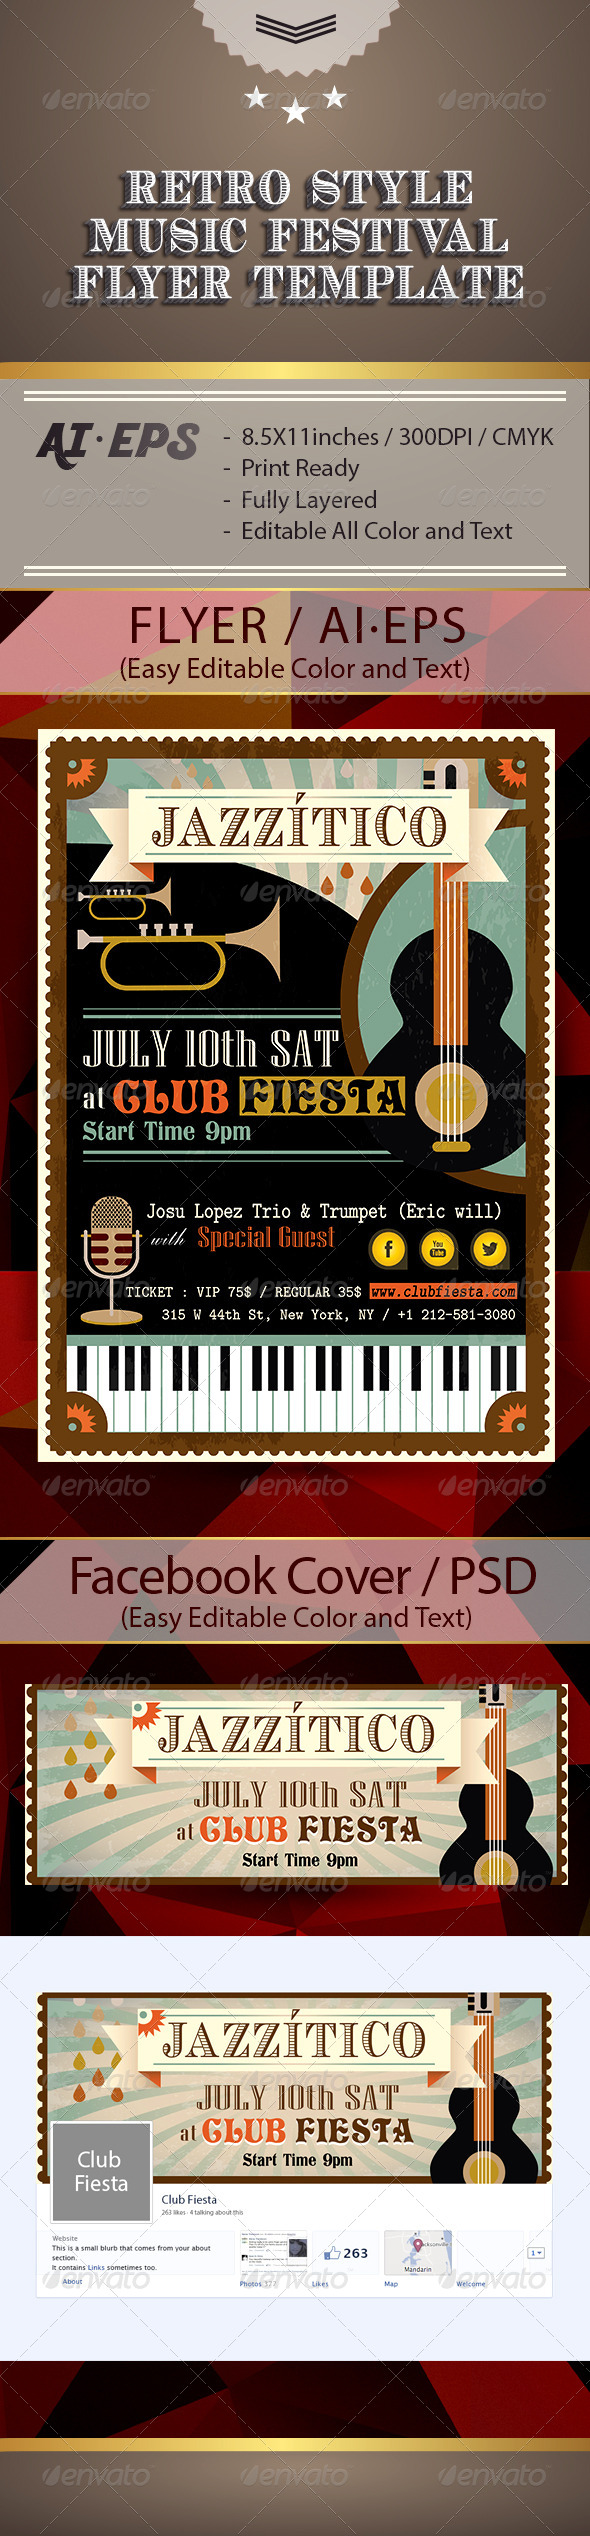 GraphicRiver Latin Jazz Retro Flyer & Facebook Cover 7740080